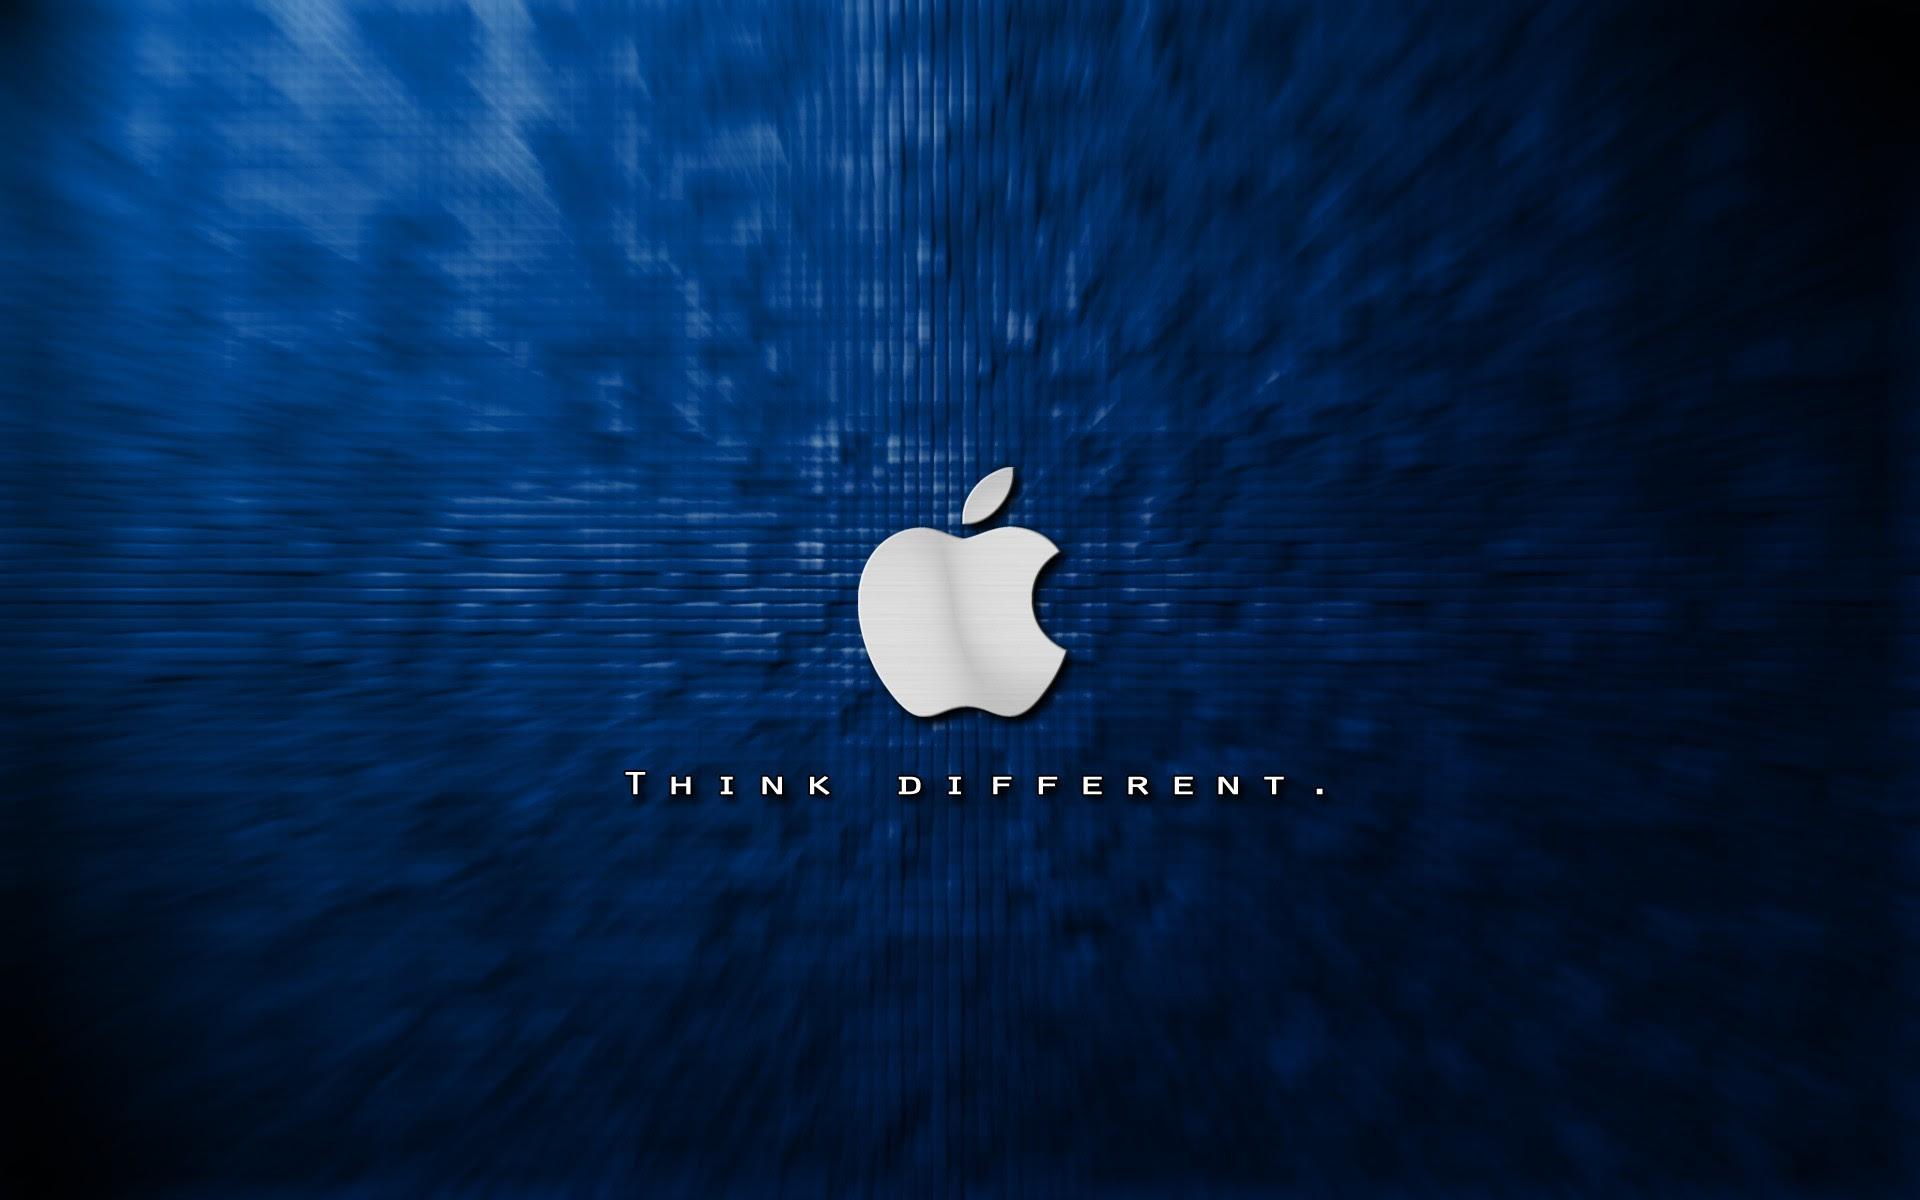 50 Cool Apple Logo Desktop Wallpaper 4k Summer Background